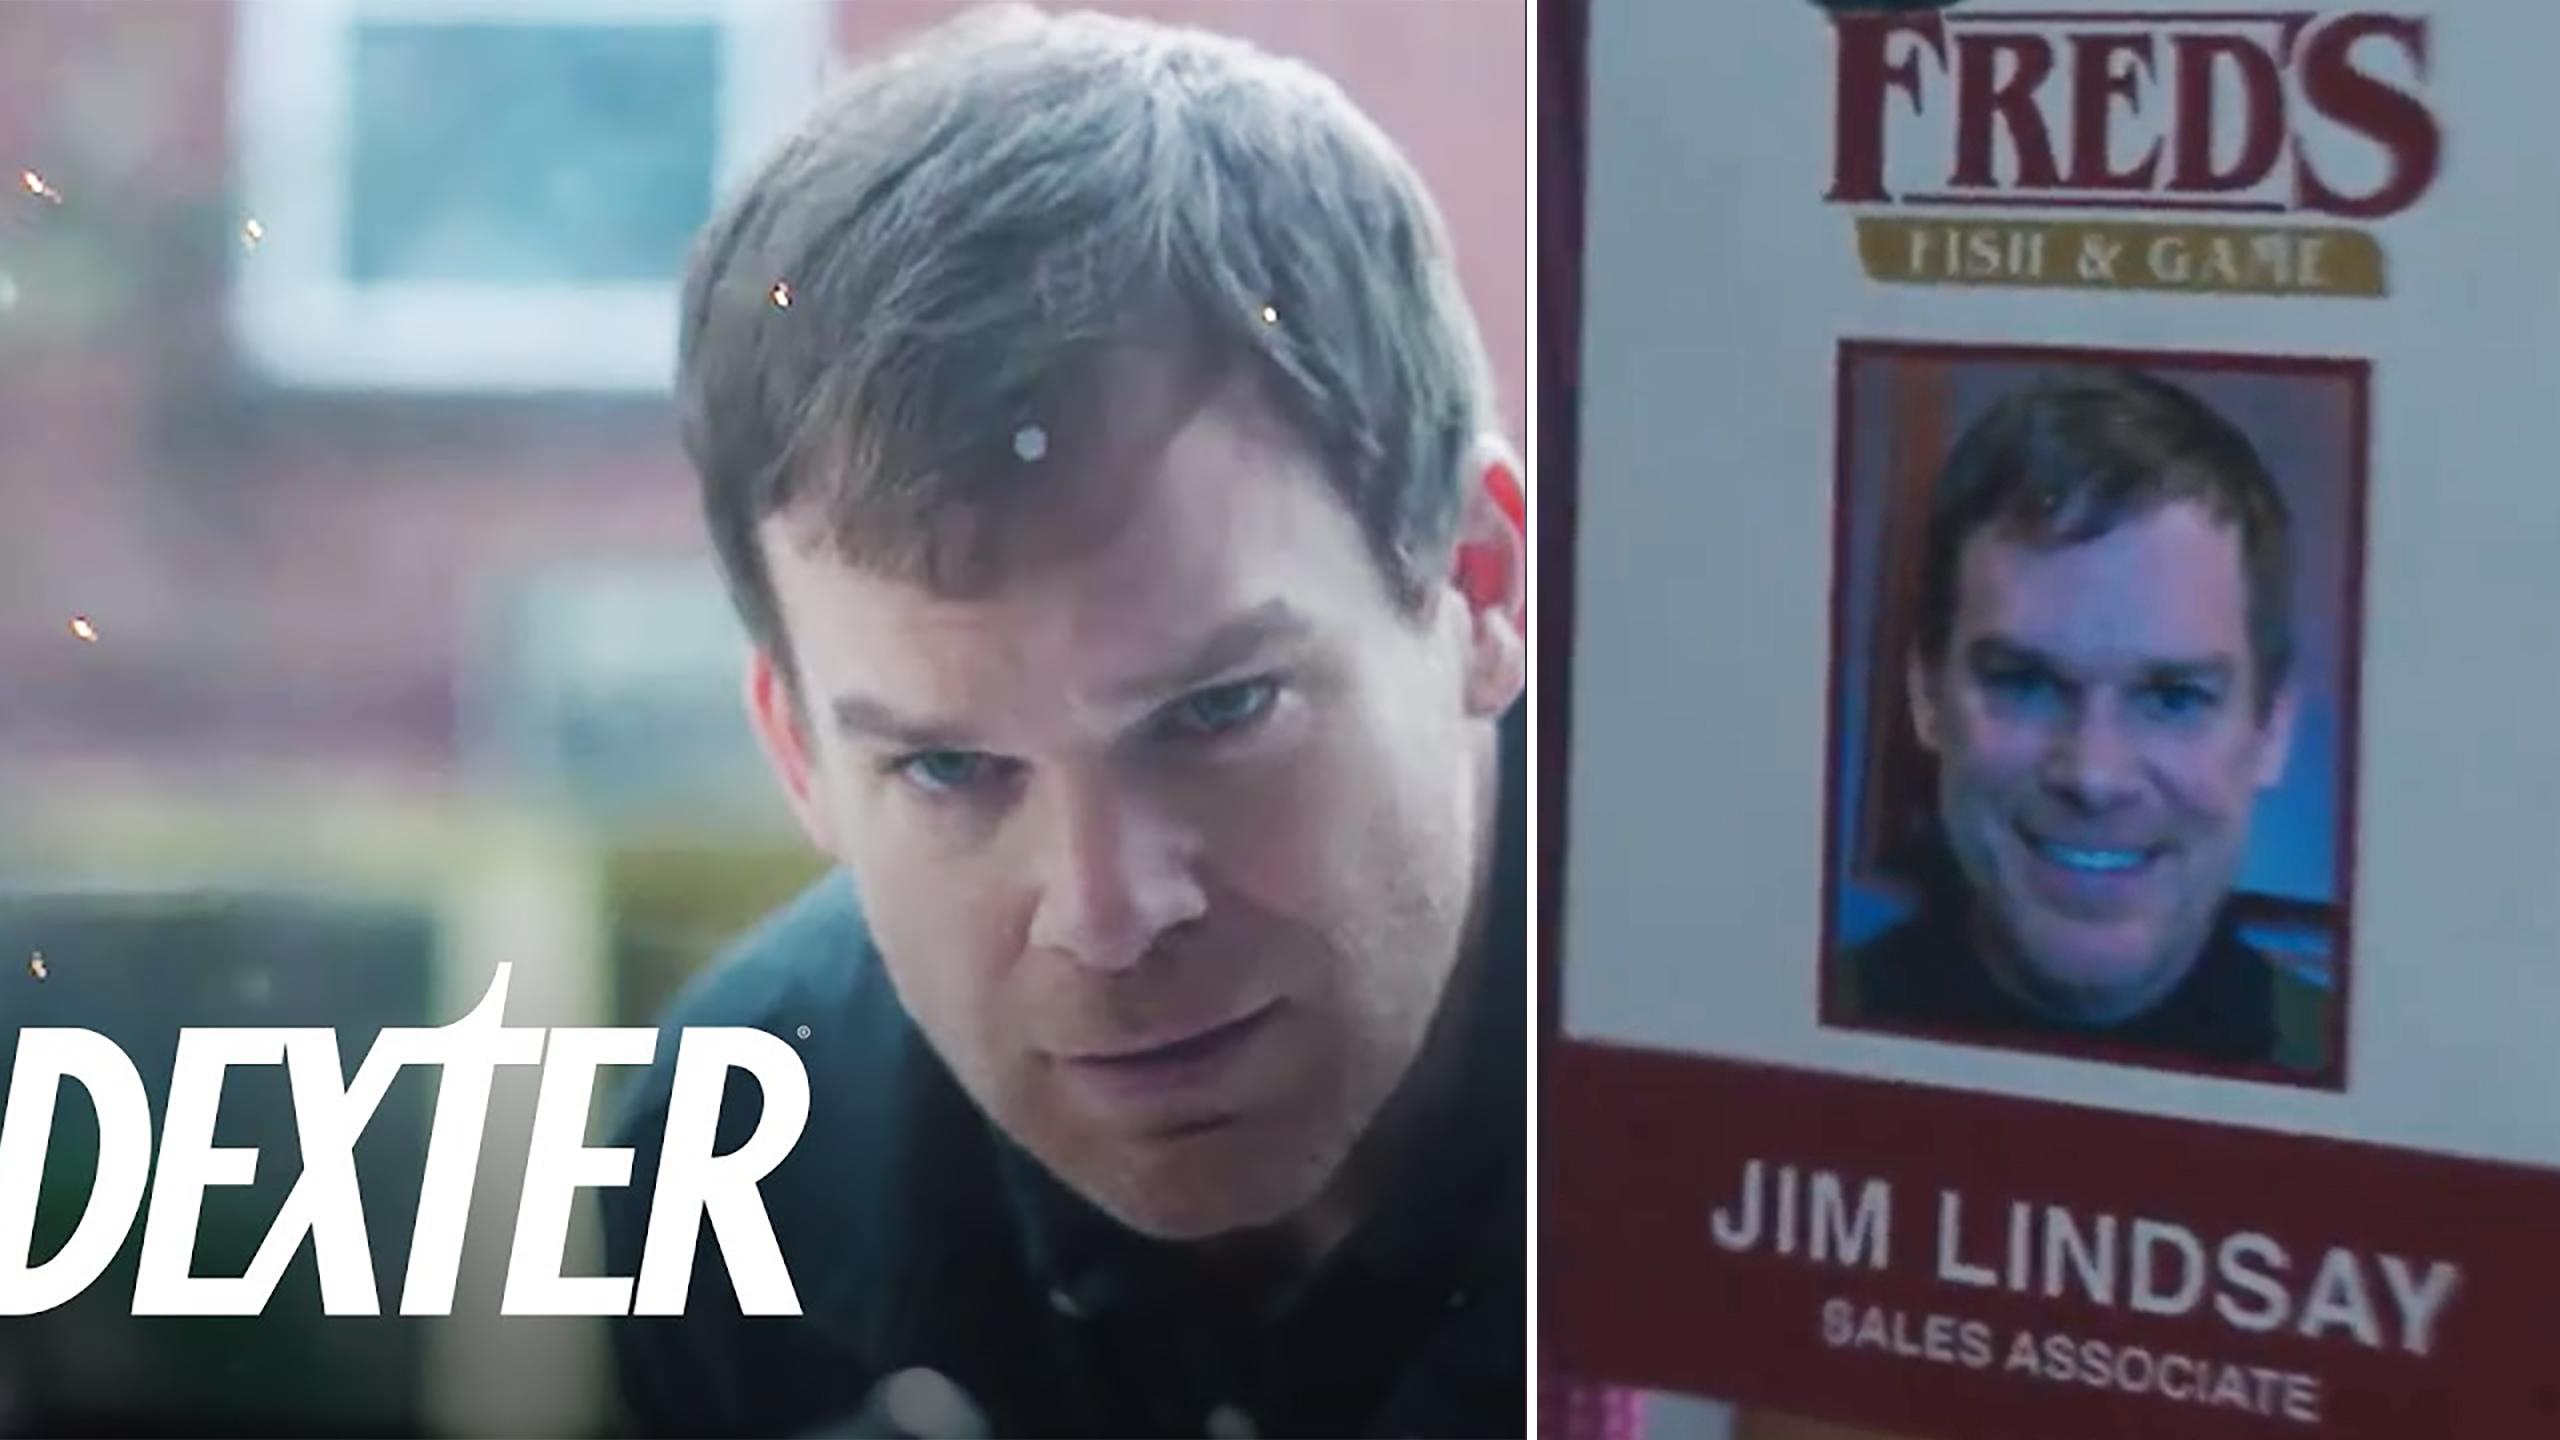 Dexter Is Jim Lindsay